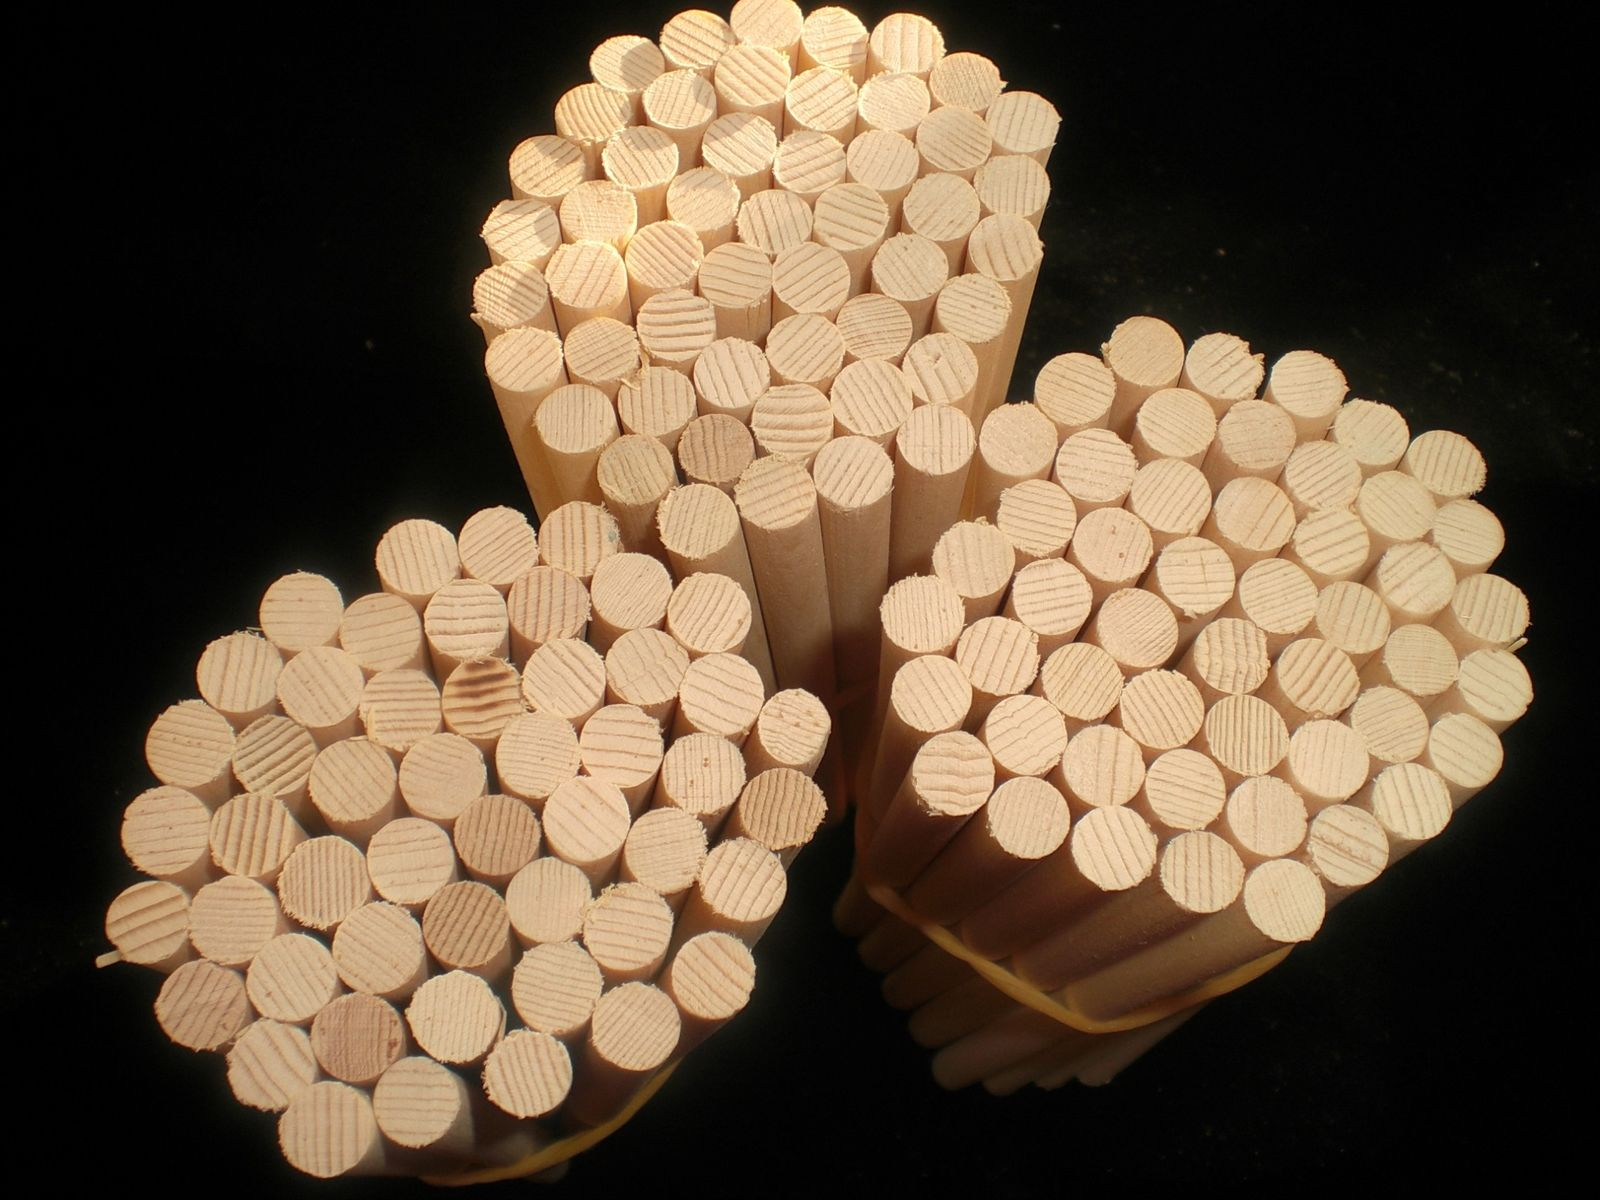 10 шт. ель дерево звук виолончели пост 8 мм диаметр 18,5 см длина